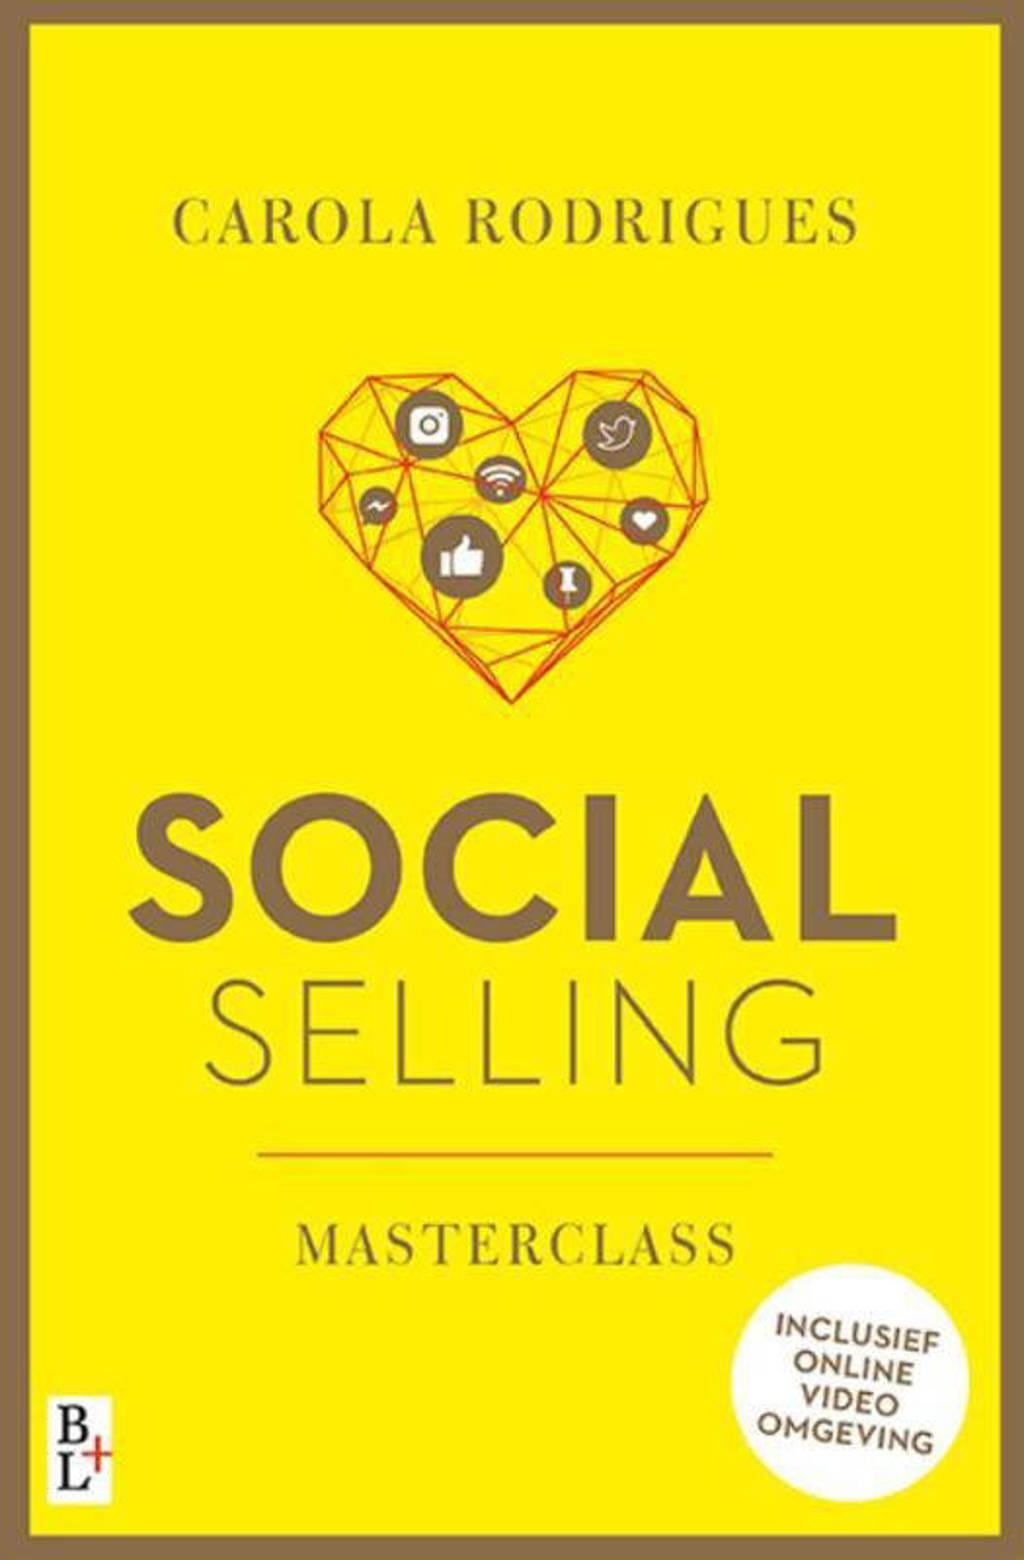 Social selling - Carola Rodrigues